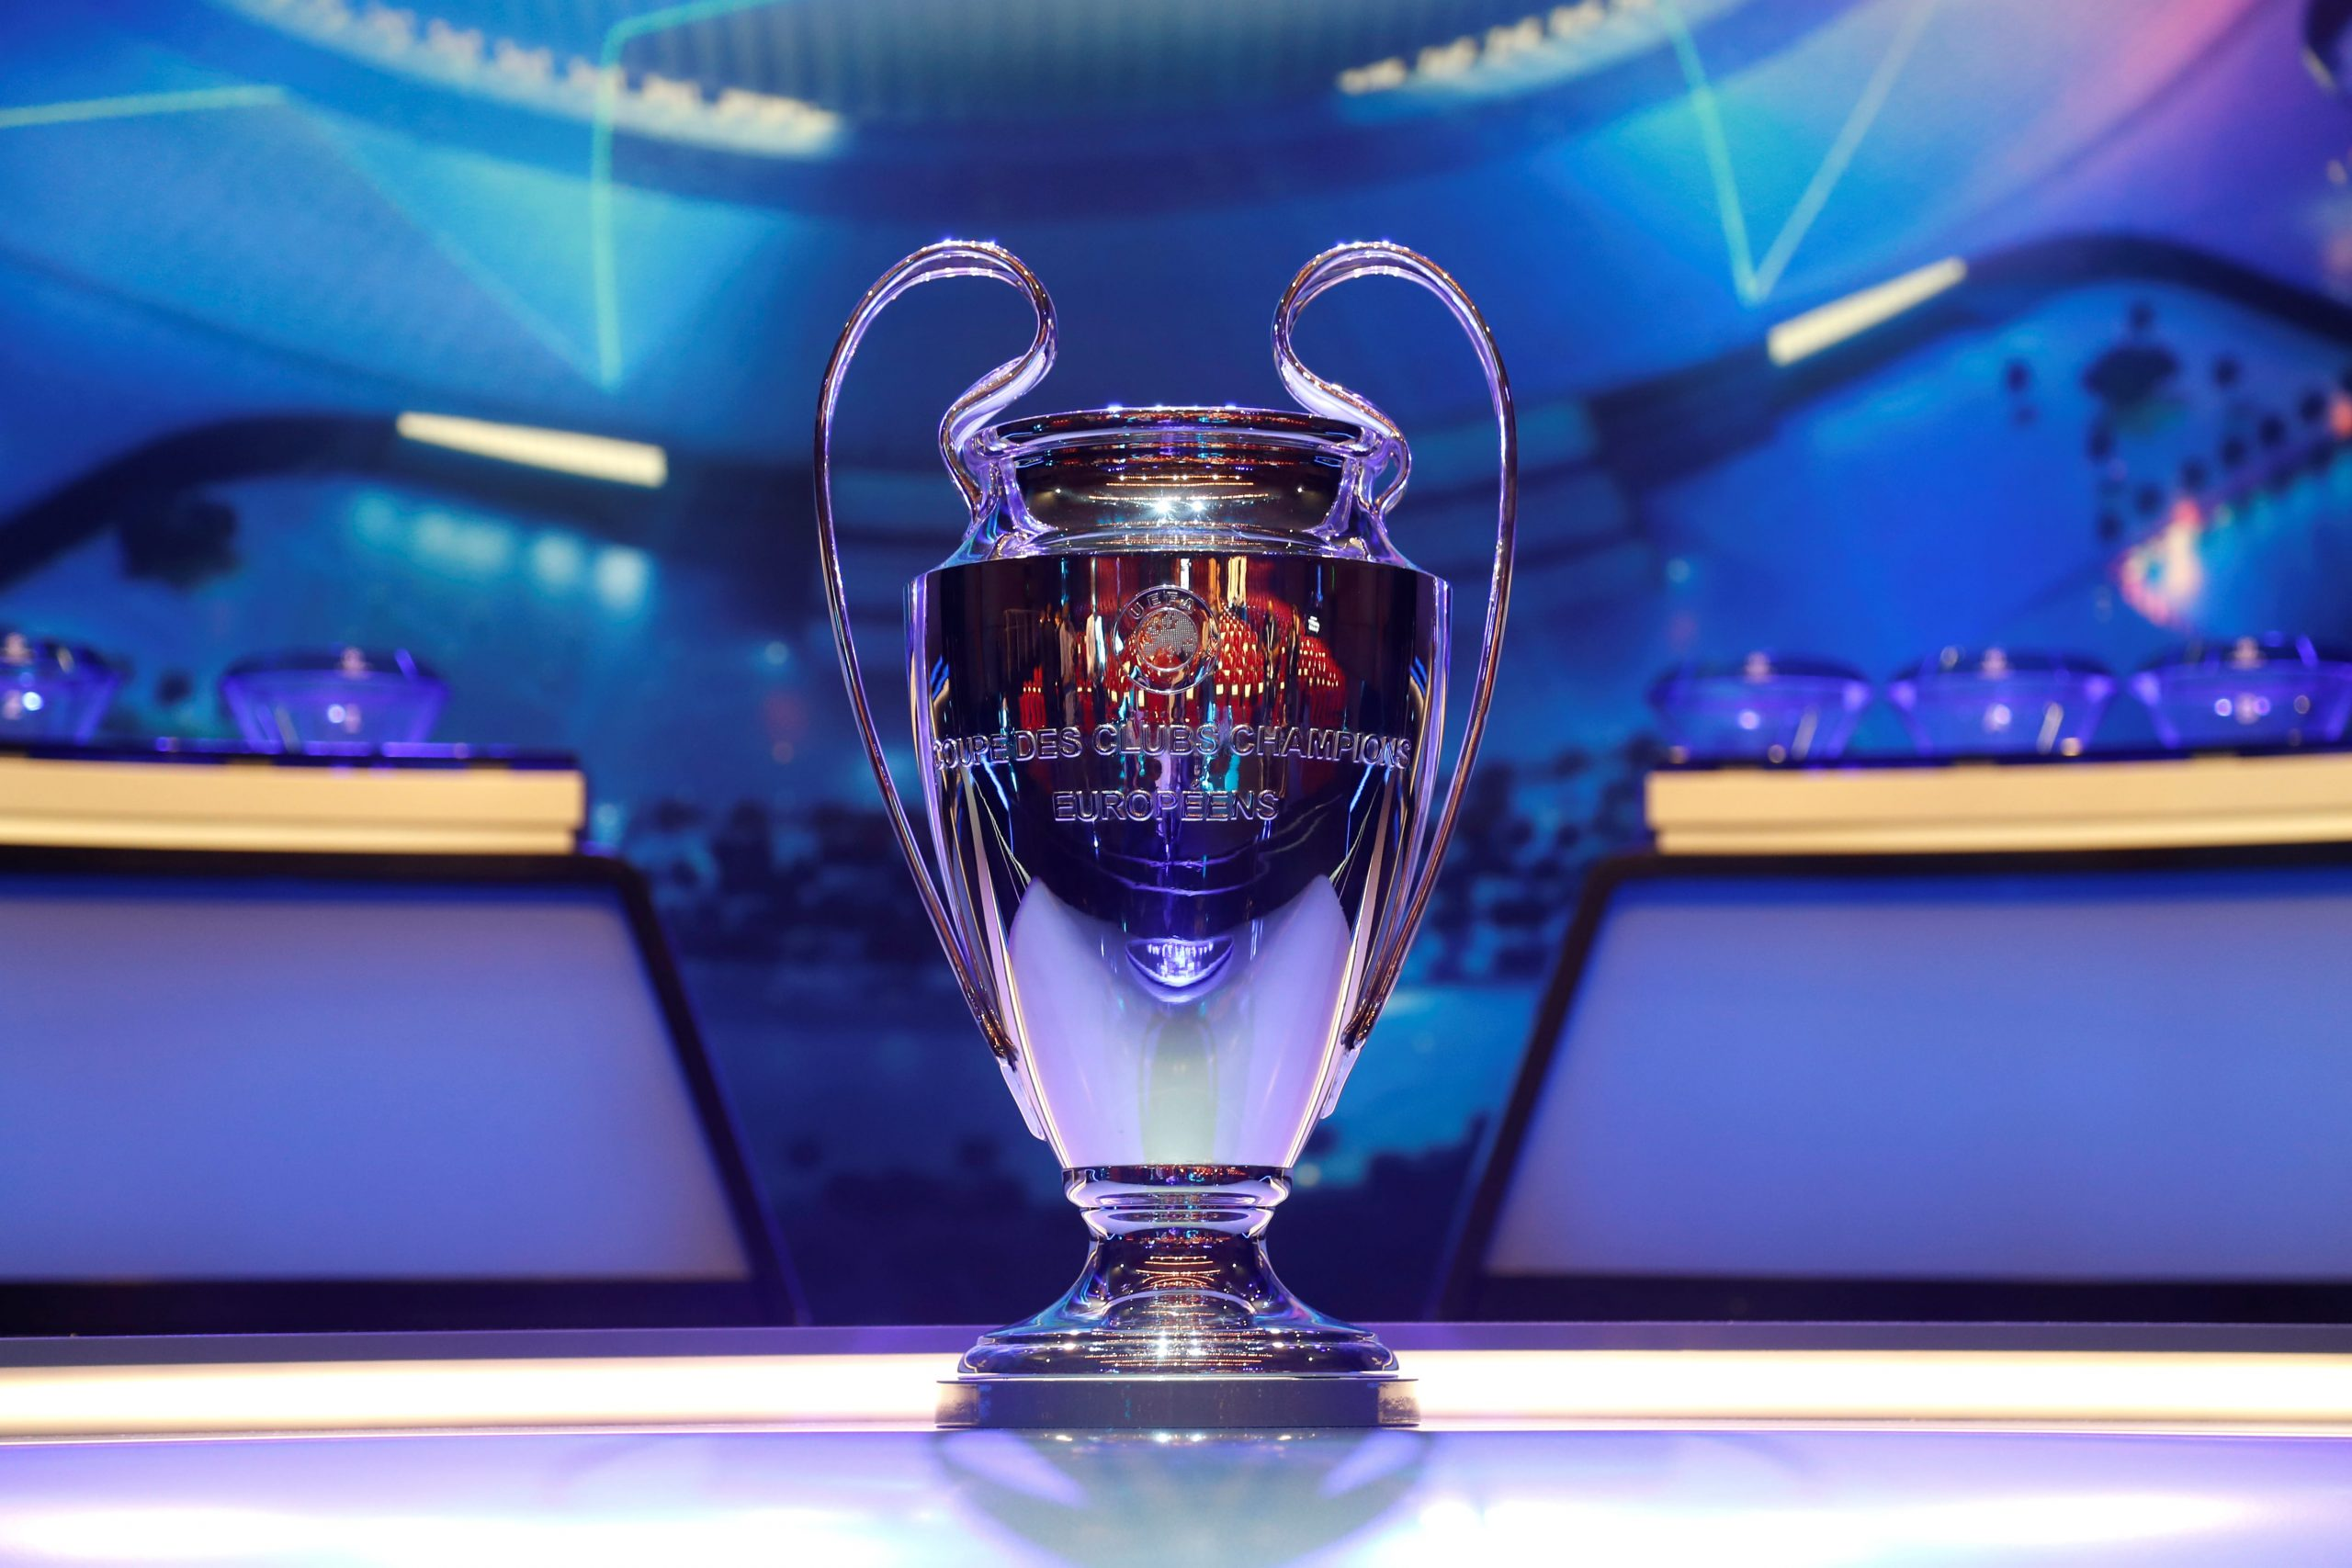 UEFA Suspends Champions League and Europa League - football show comes to a halt